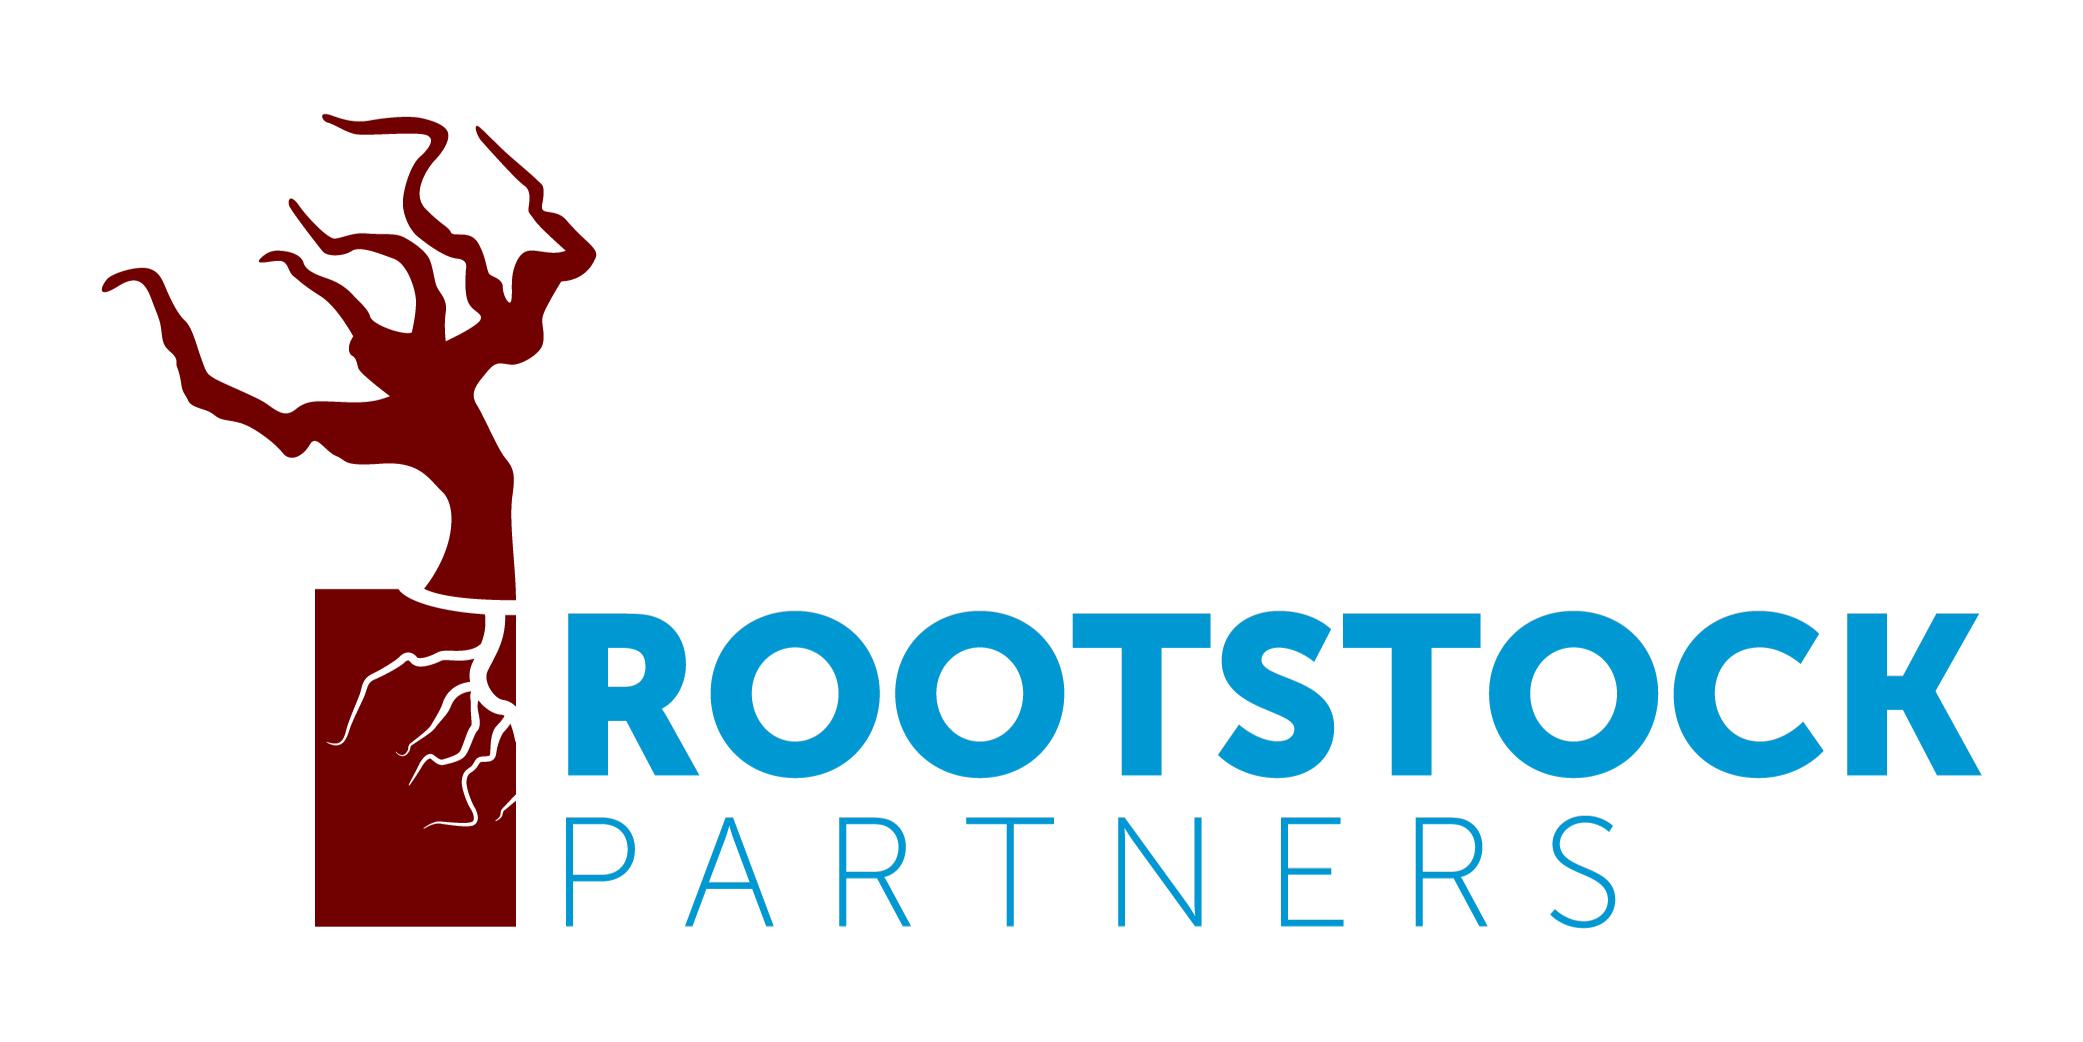 Rootstock Partners